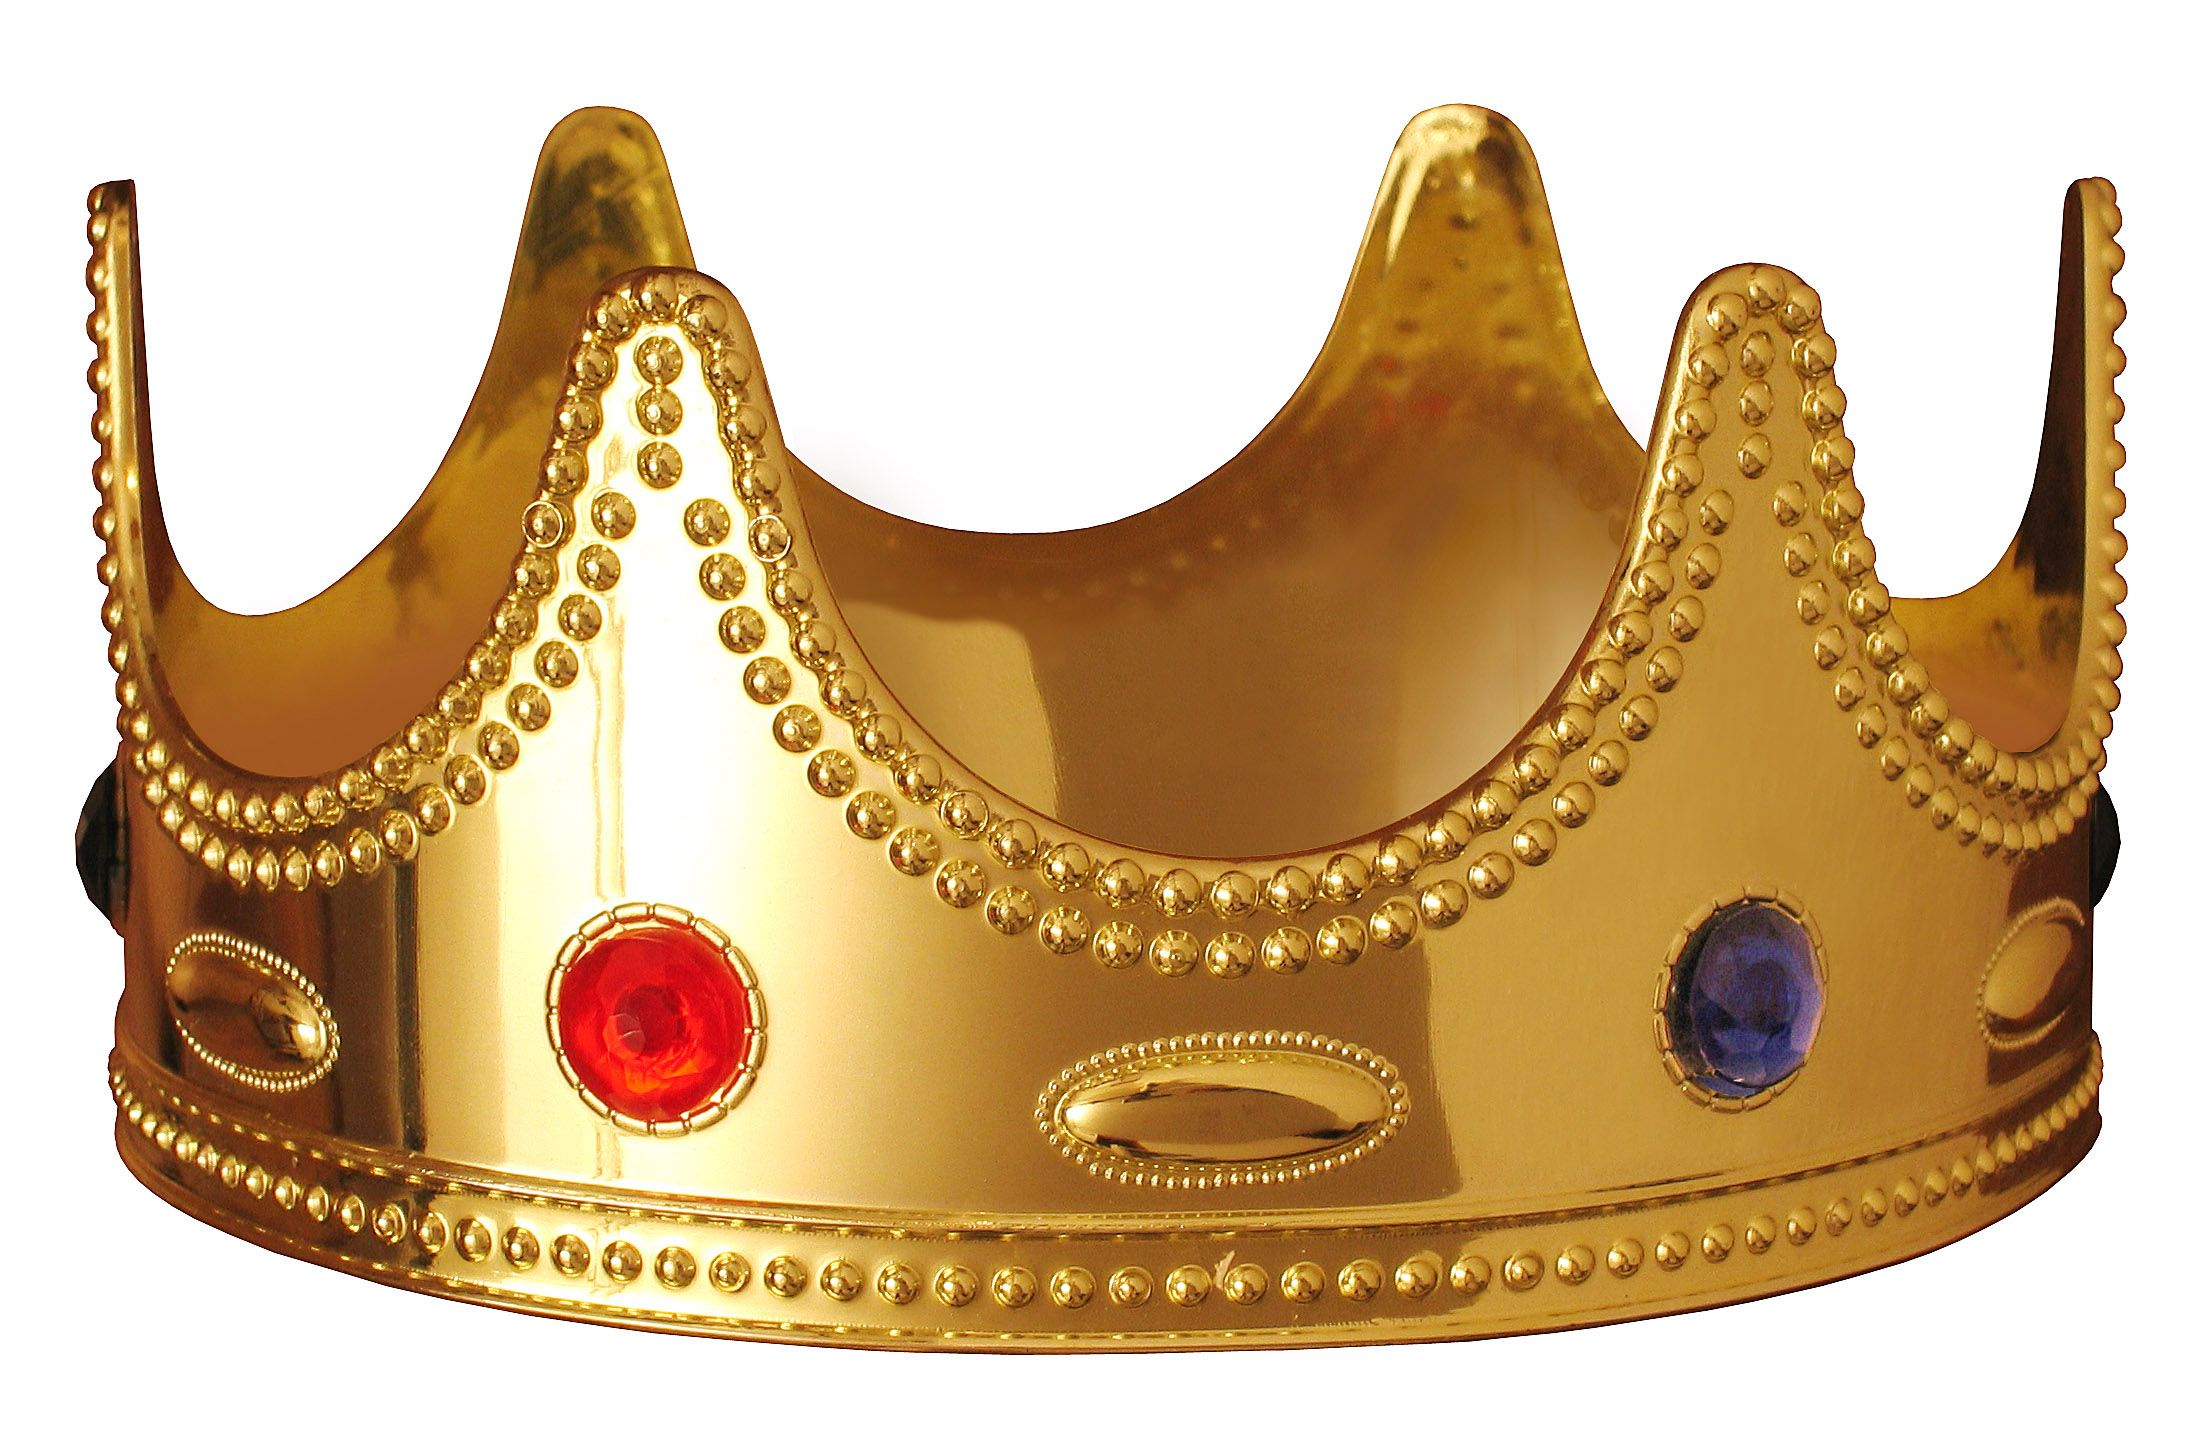 Crown Jpg 2208 1456 Crown Png Kids Party Themes Red Crown